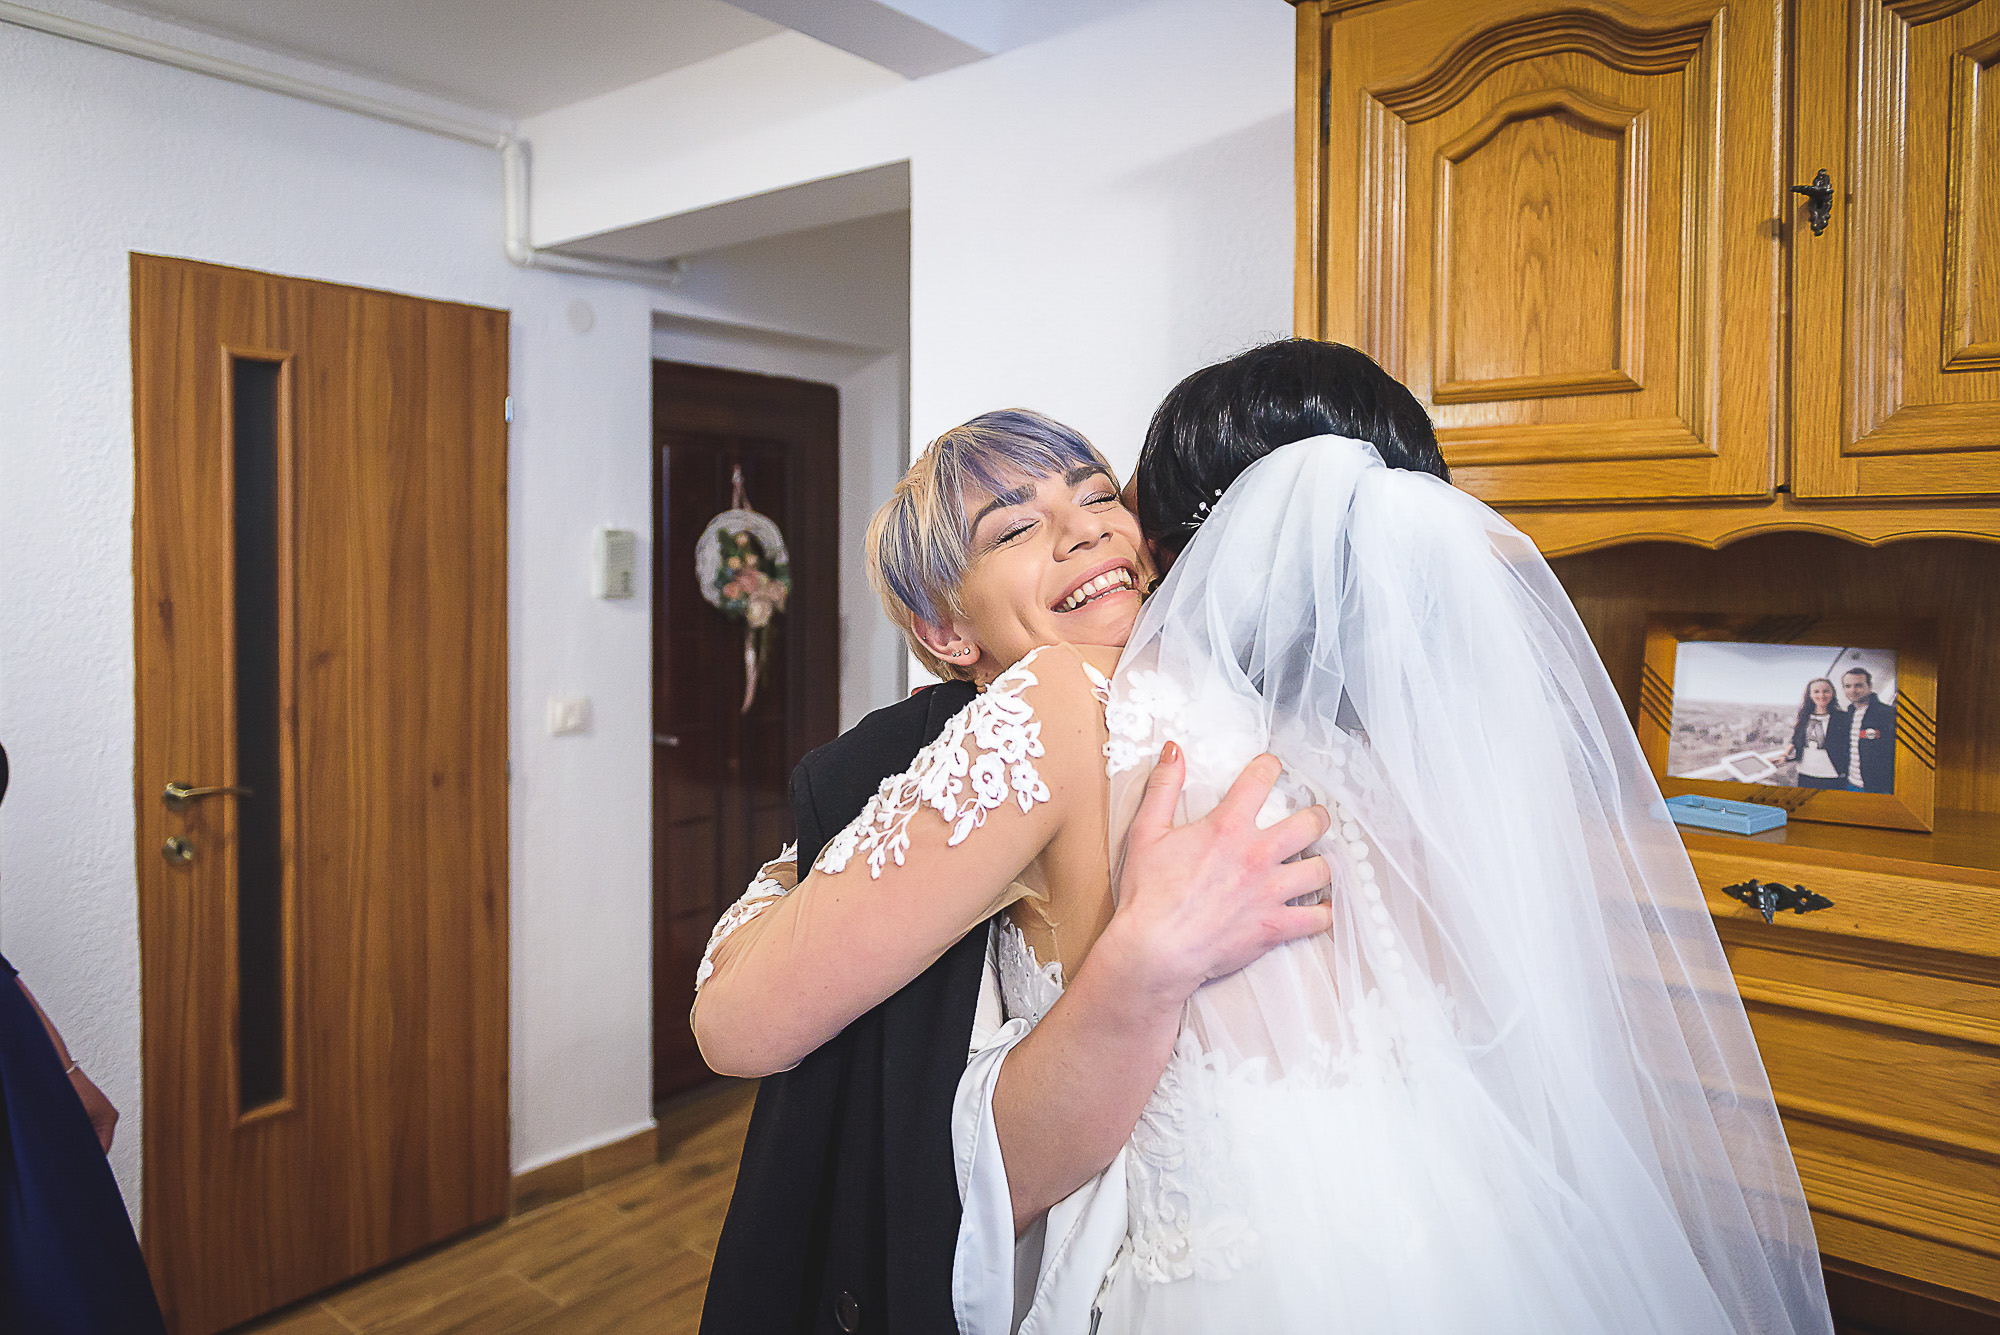 fotografie creativa de nunta, fotograf nunta mures, foto nunta reghin, foto video reghin, pregatirile miresei, preitene, bucurie,